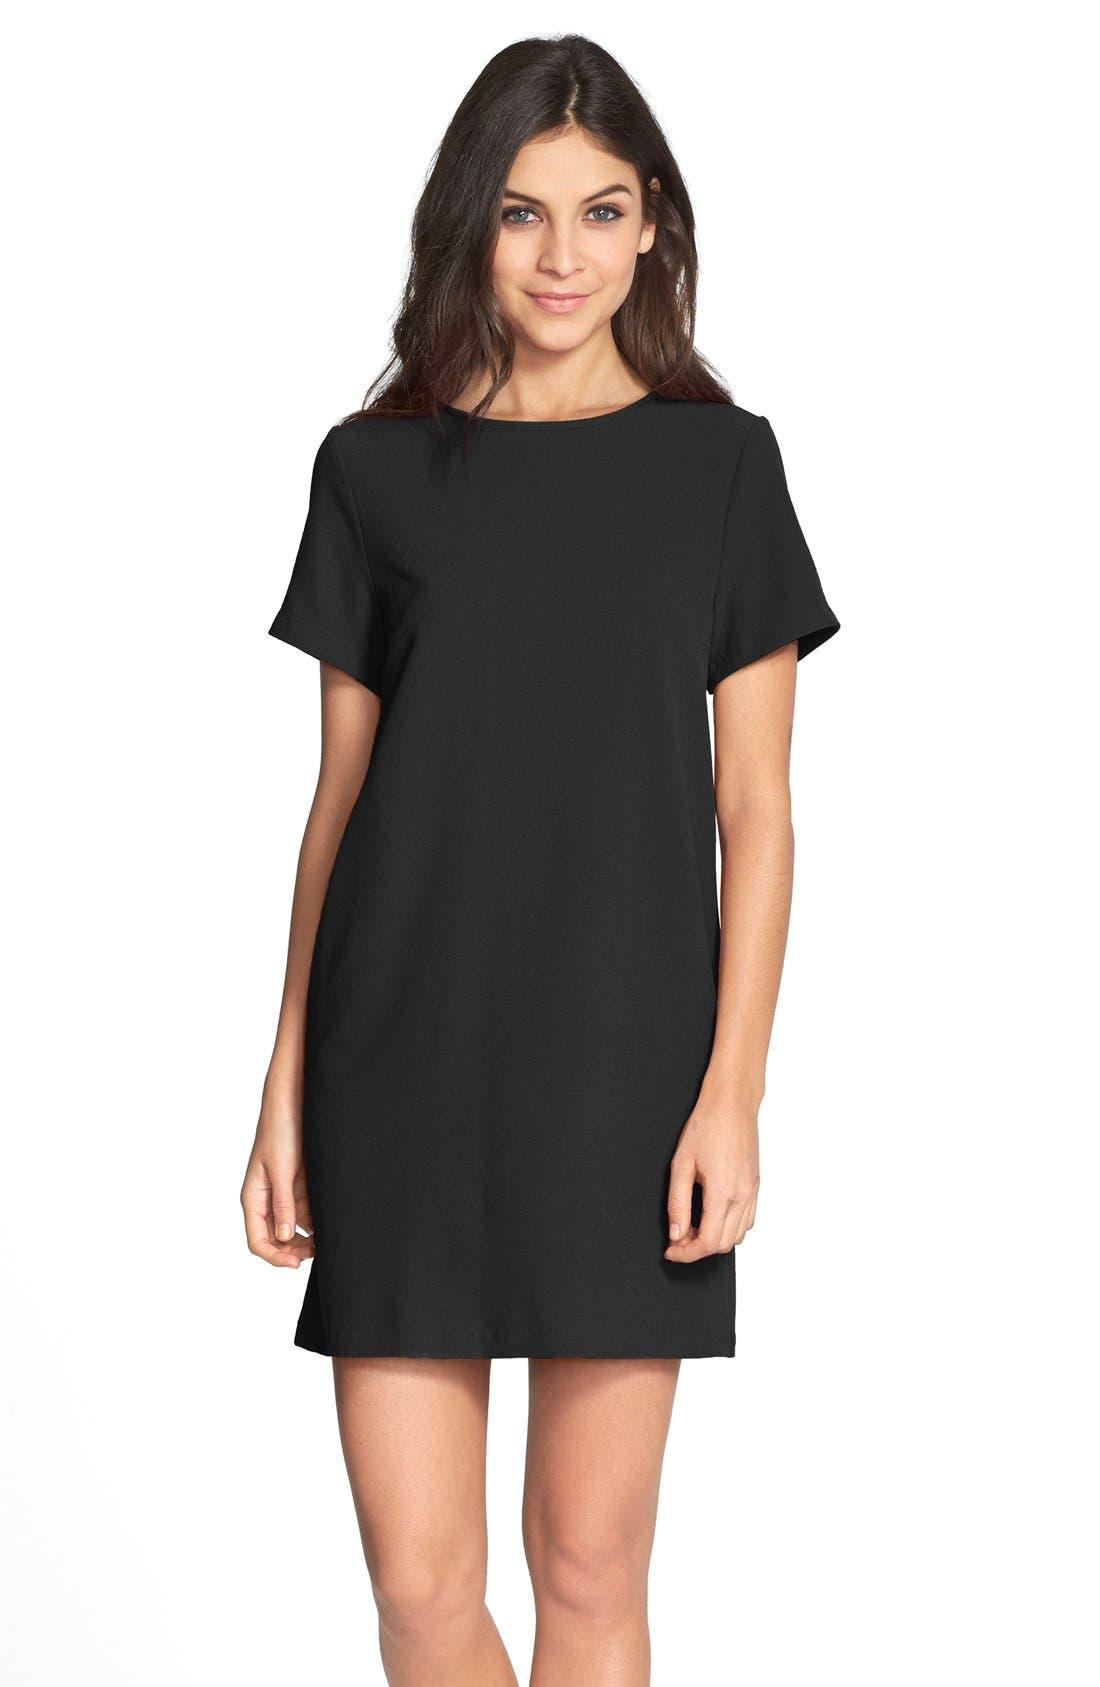 Little Black Dresses for Teenagers